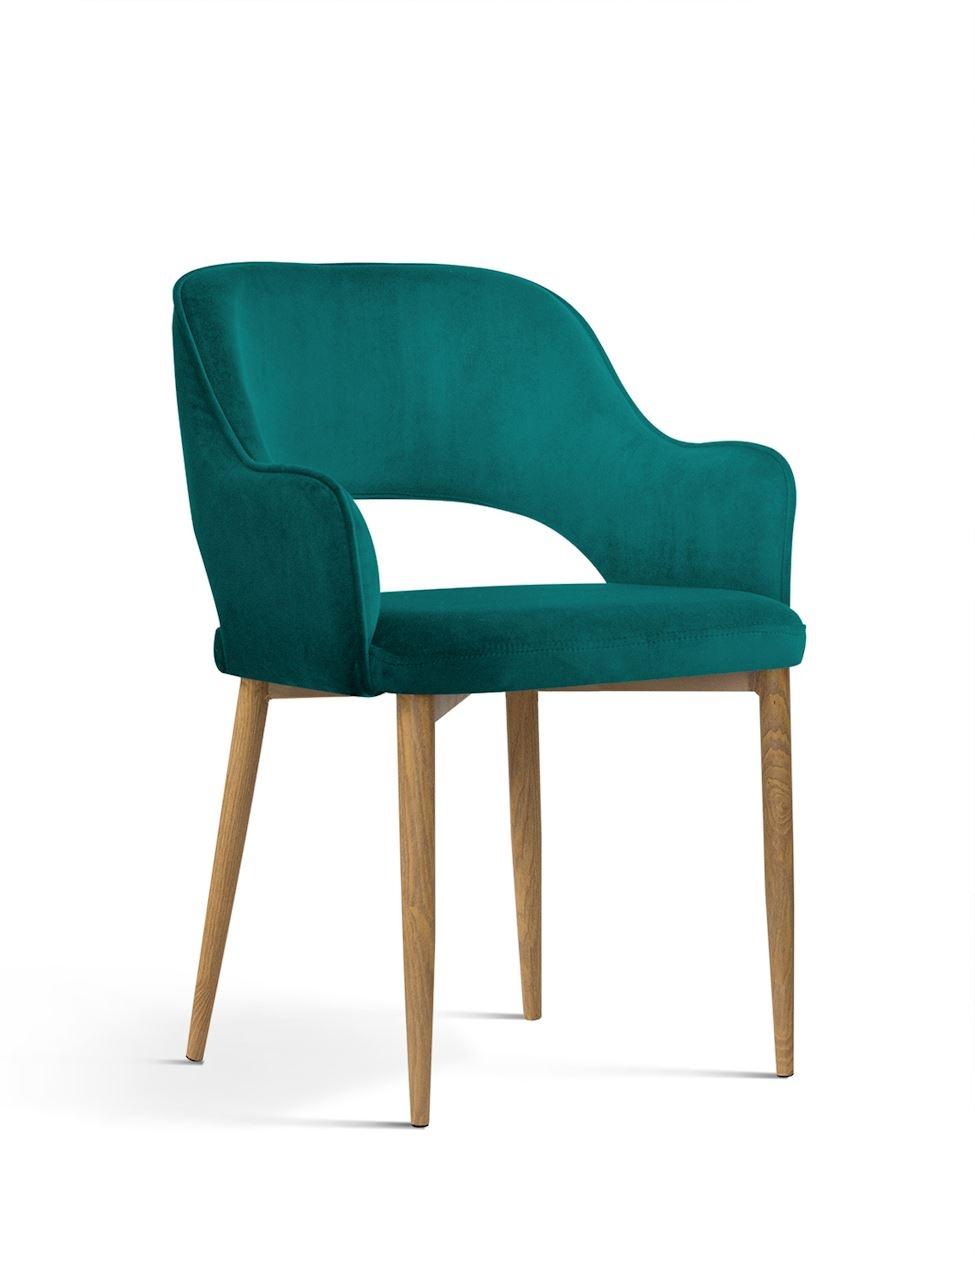 Scaun tapitat cu stofa, cu picioare metalice Mercy Turquoise / Oak, l53xA60xH79 cm